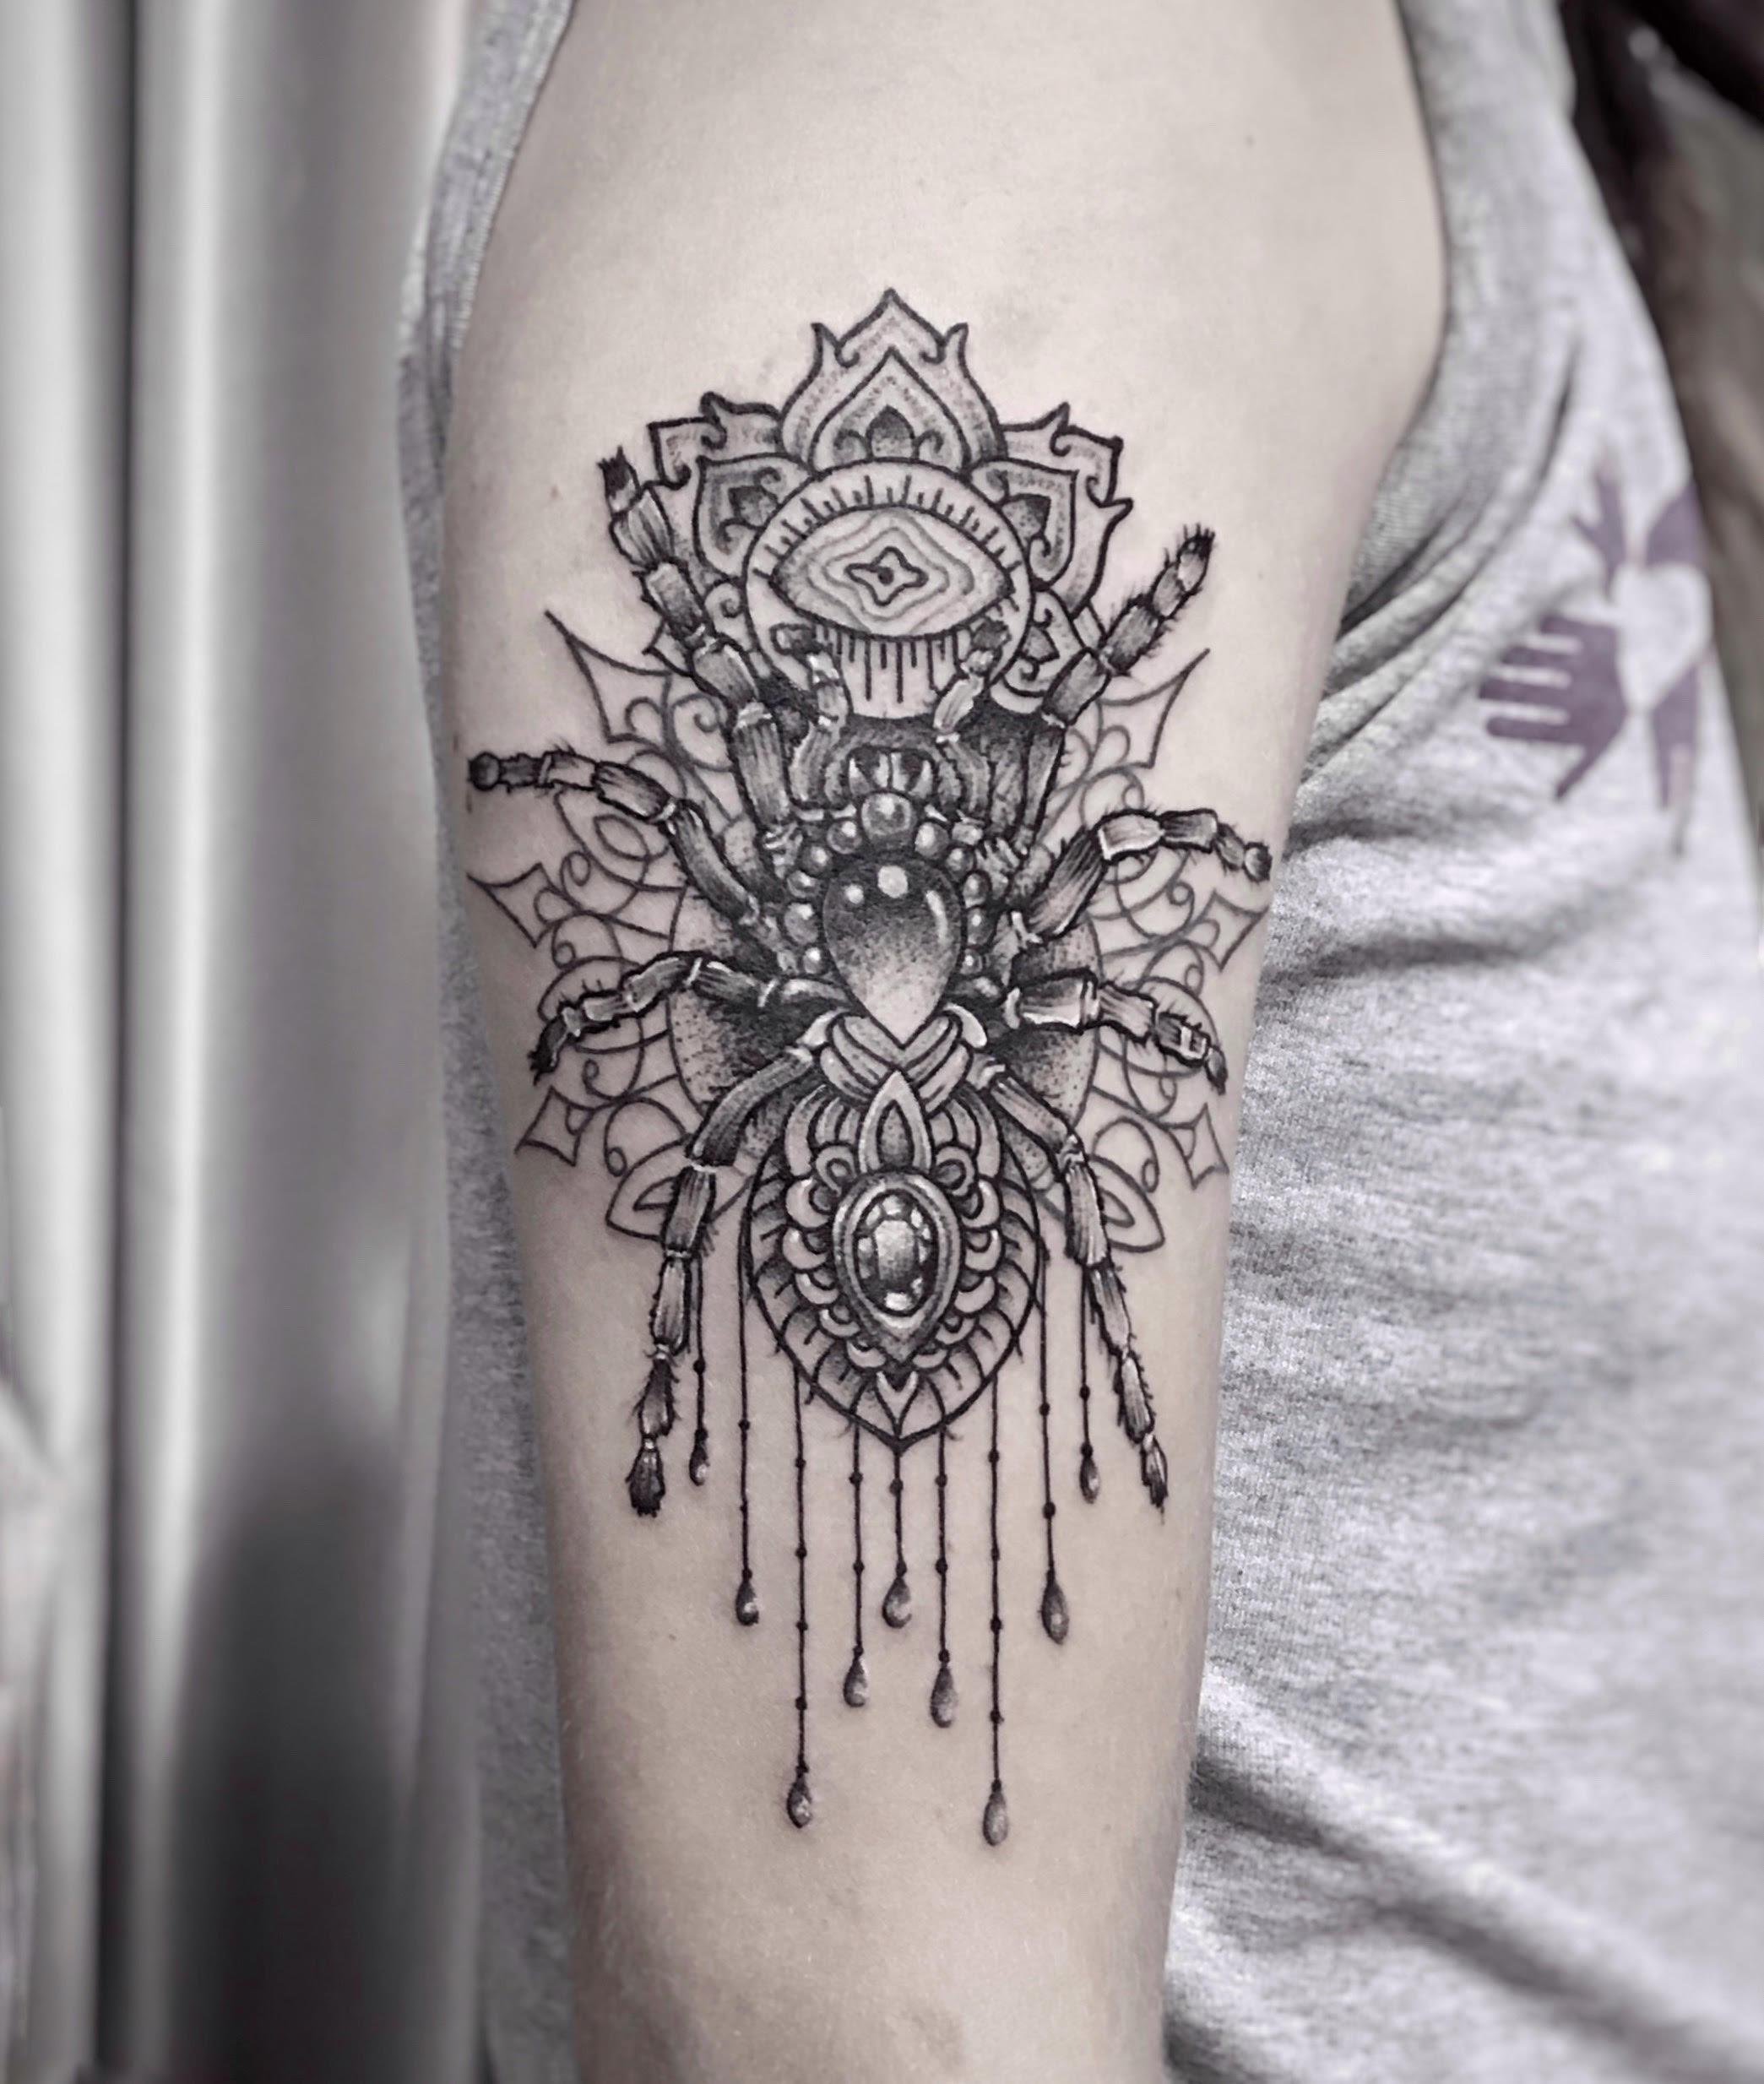 Ornamental Spider Tattoo Nepal by Sumina Shrestha